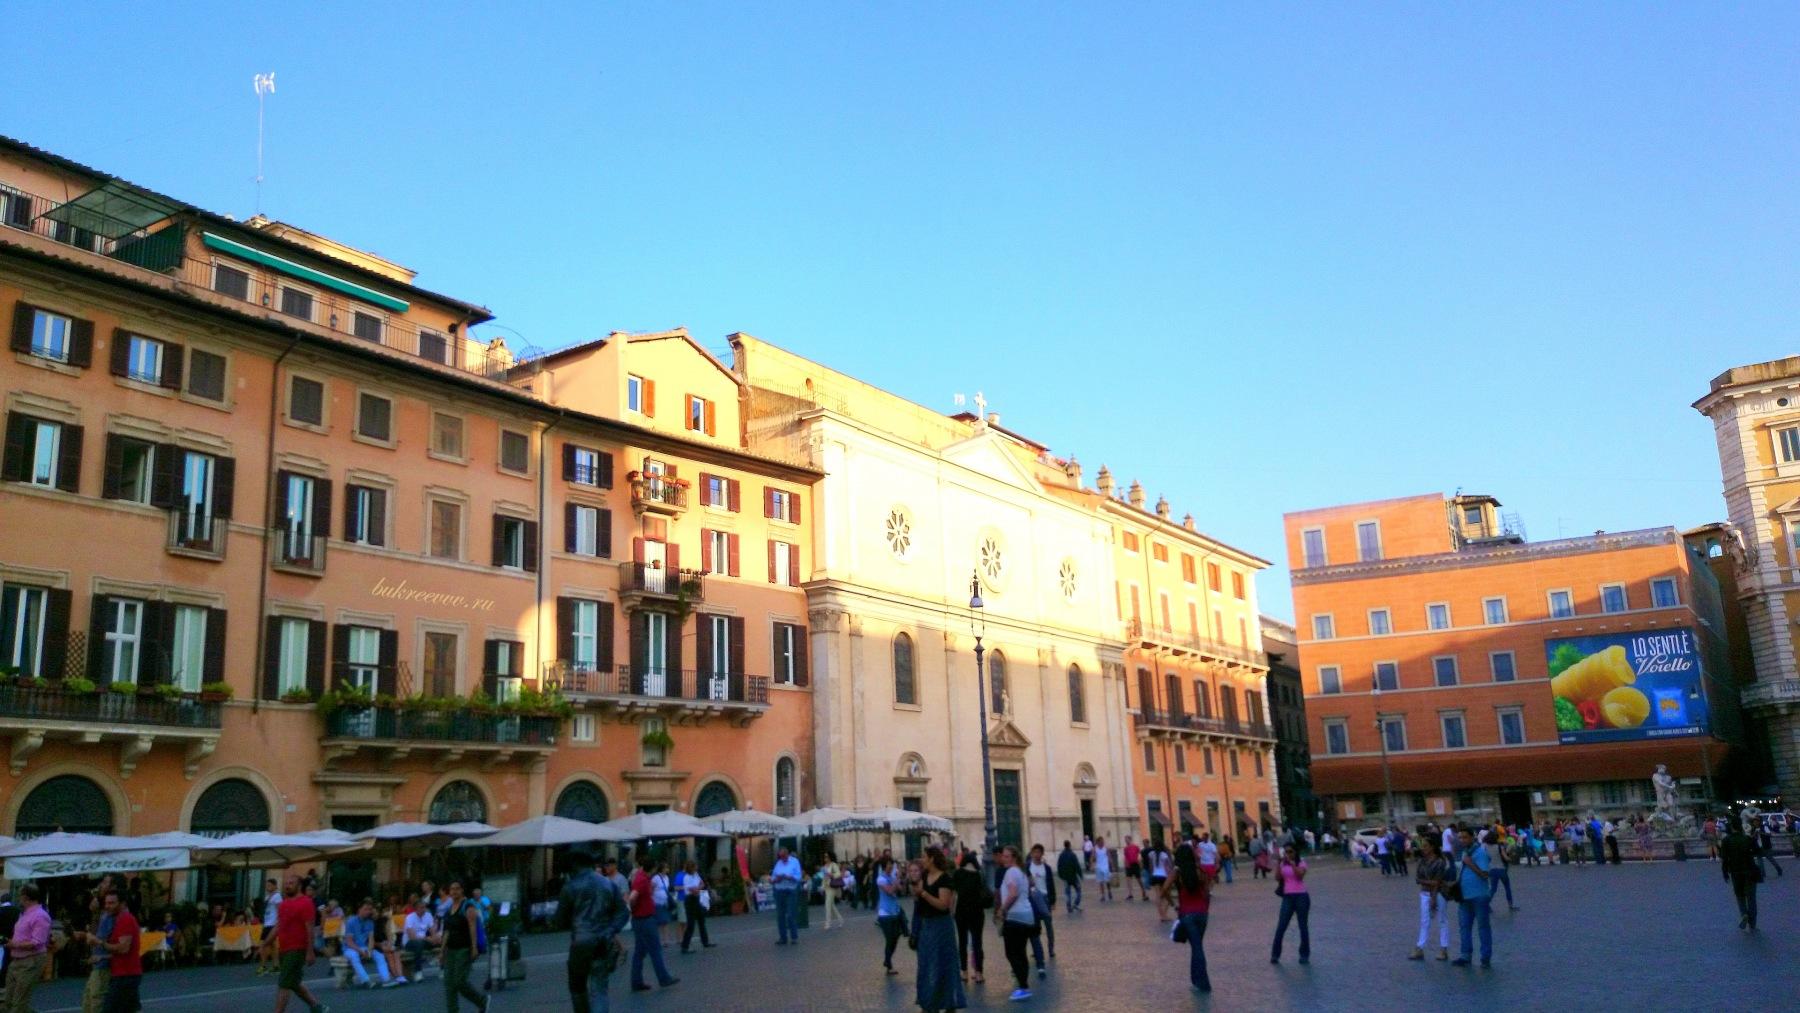 Piazza Navona 73